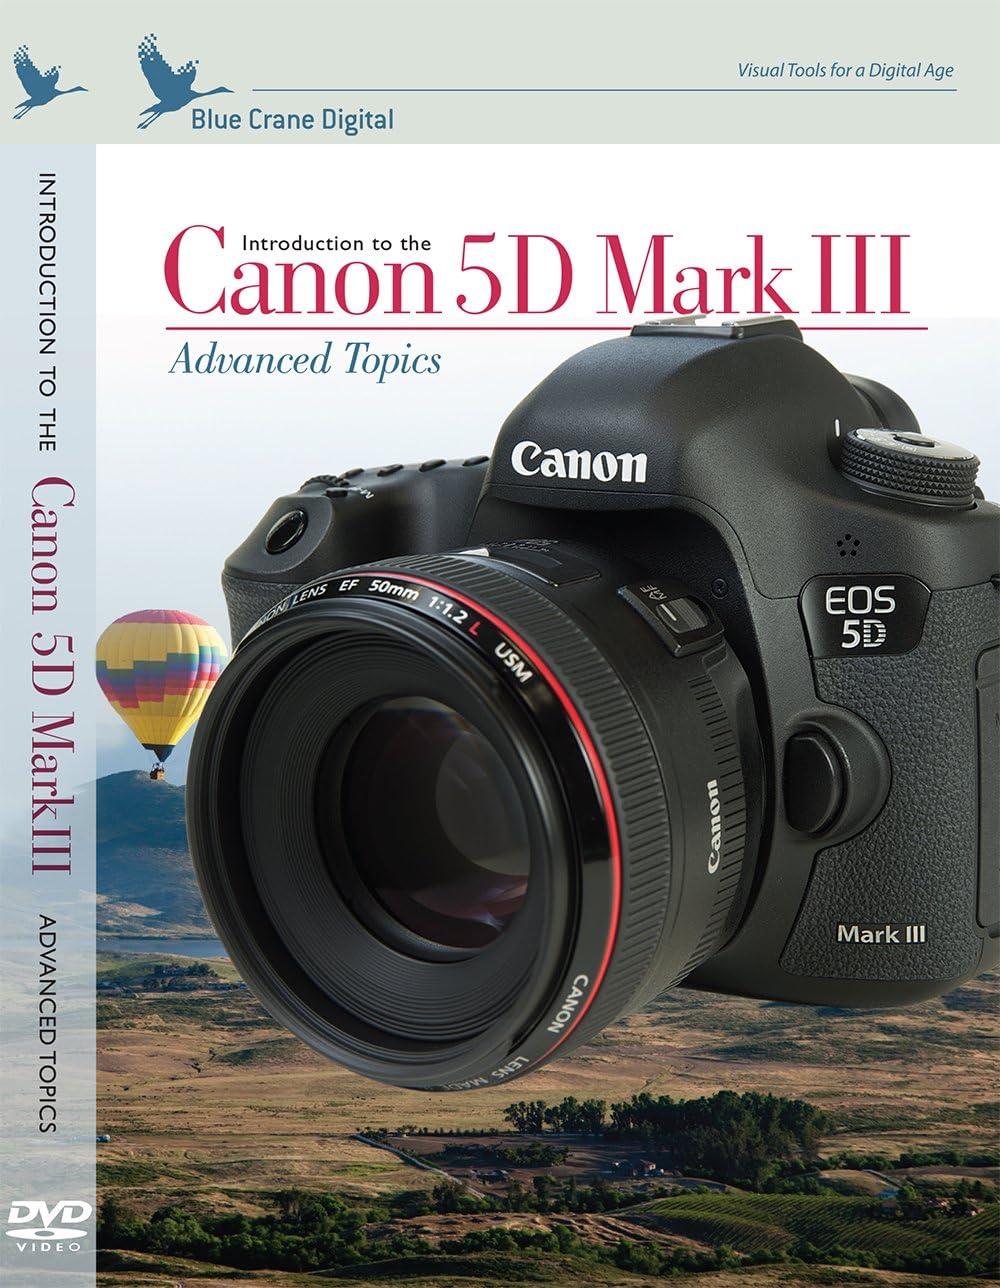 zBC143 Basic Controls Blue Crane Digital Introduction to the Canon 5D Mark III